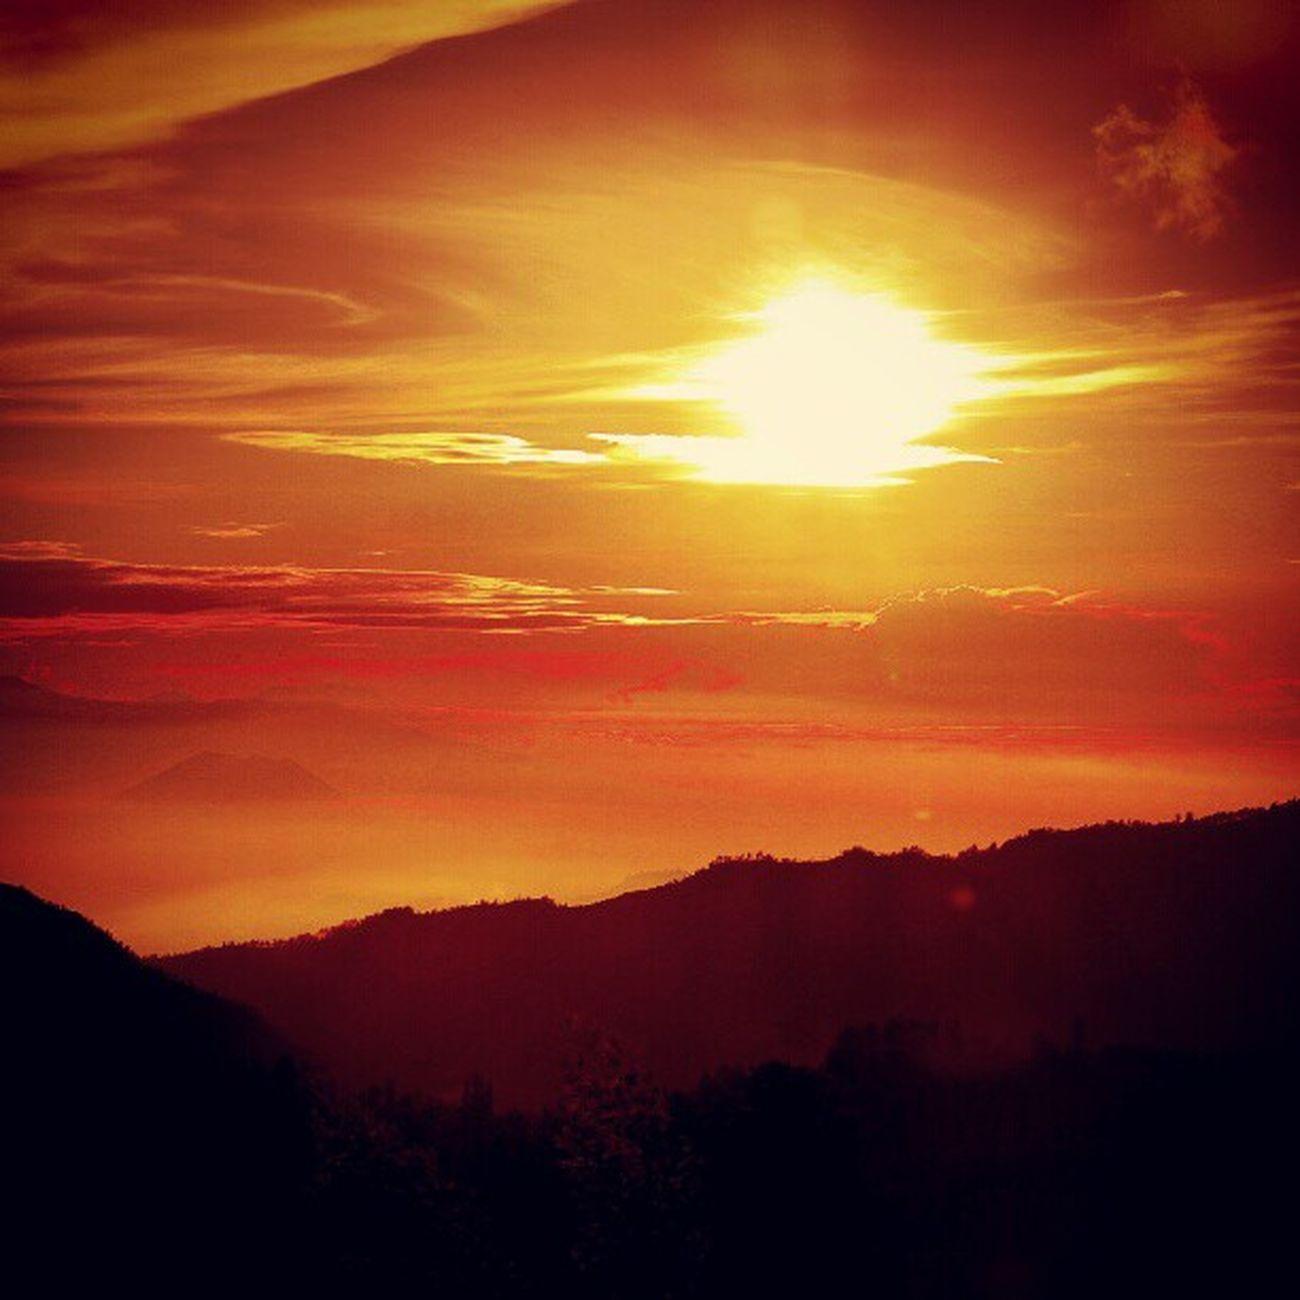 Sunrise di Bromo Upload bersama @instanusantara Inub0723 Instanusantarapalingindonesia Instanusantaramalang Ic_landscape Sunrise_madness Bromo Igelinesia